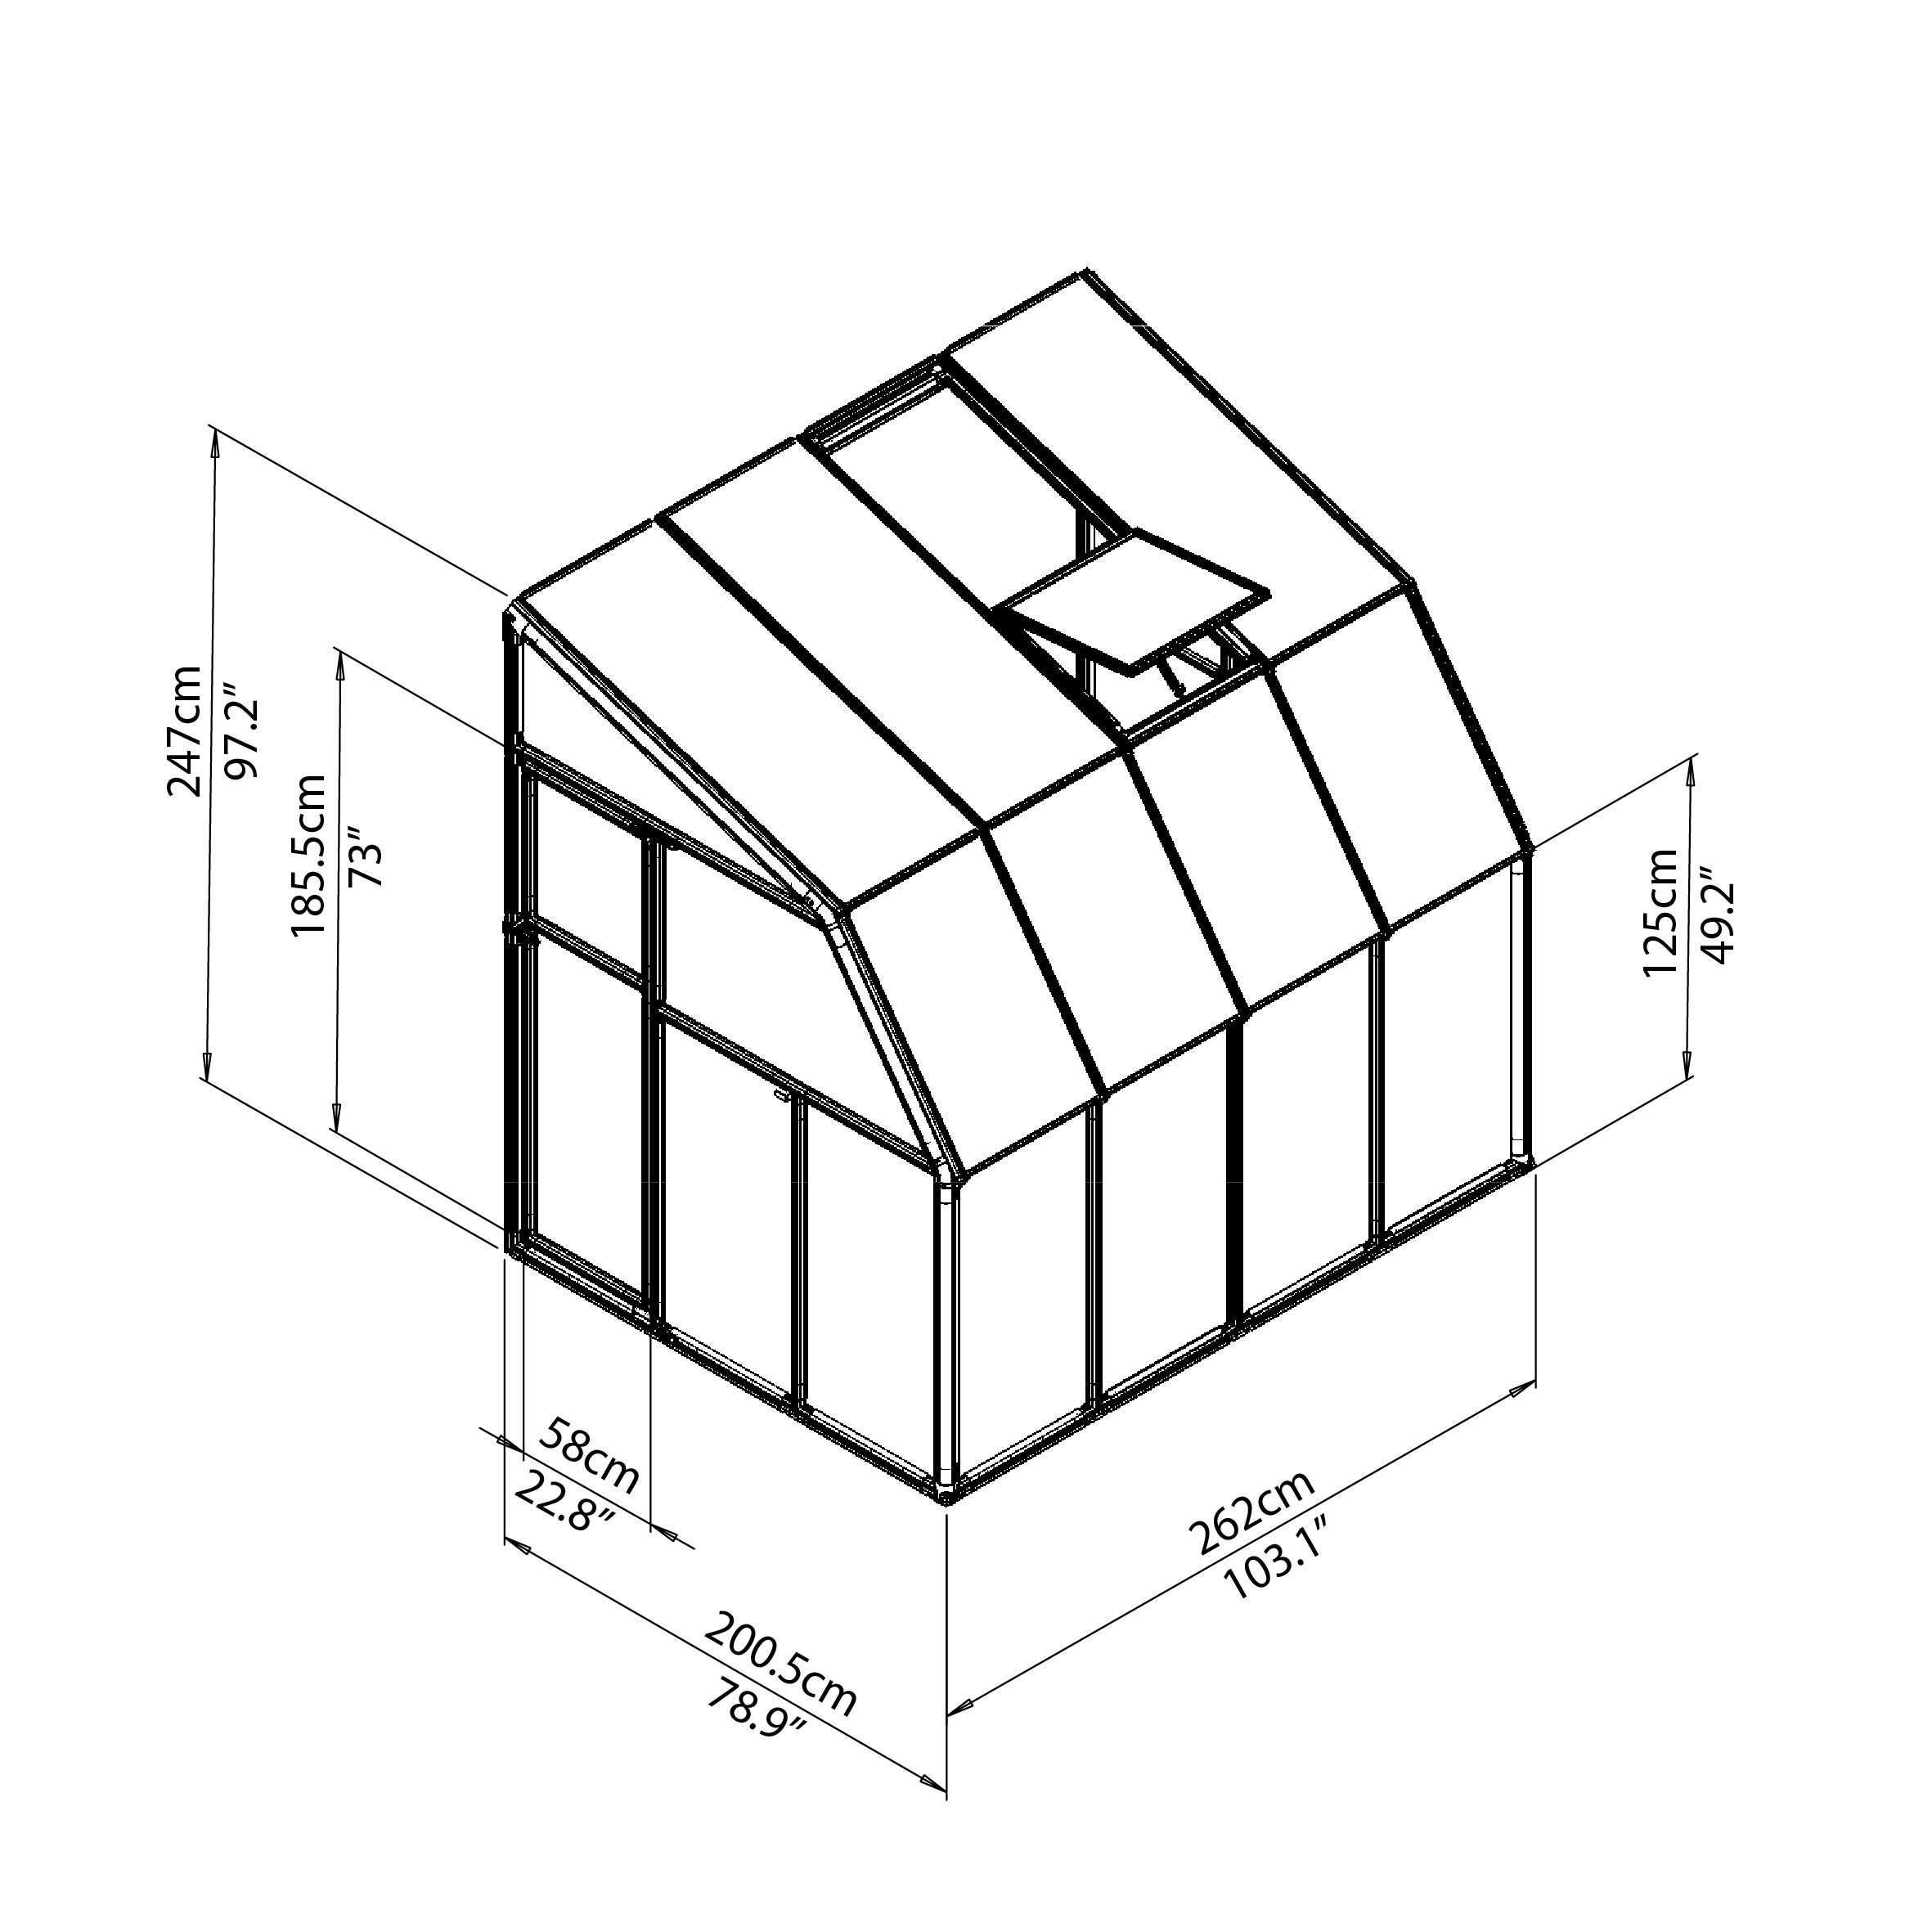 rion-greenhouses-sunroom-6x8-drawing-isoview.jpg